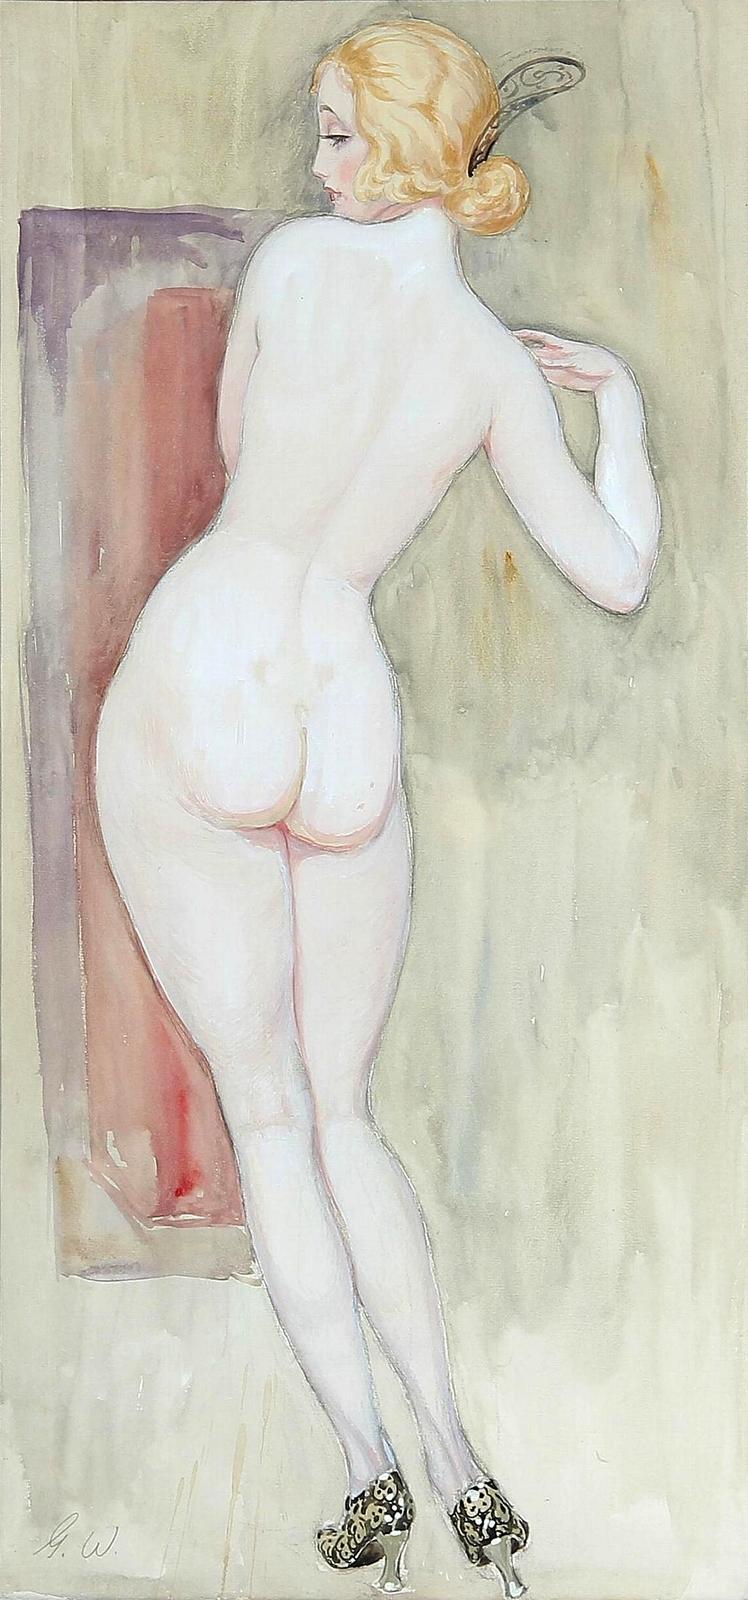 1922_Обнаженная со спины (Back turned female nude in pumps)_75 x 35_бумага, акварель_Частное собрание.jpg